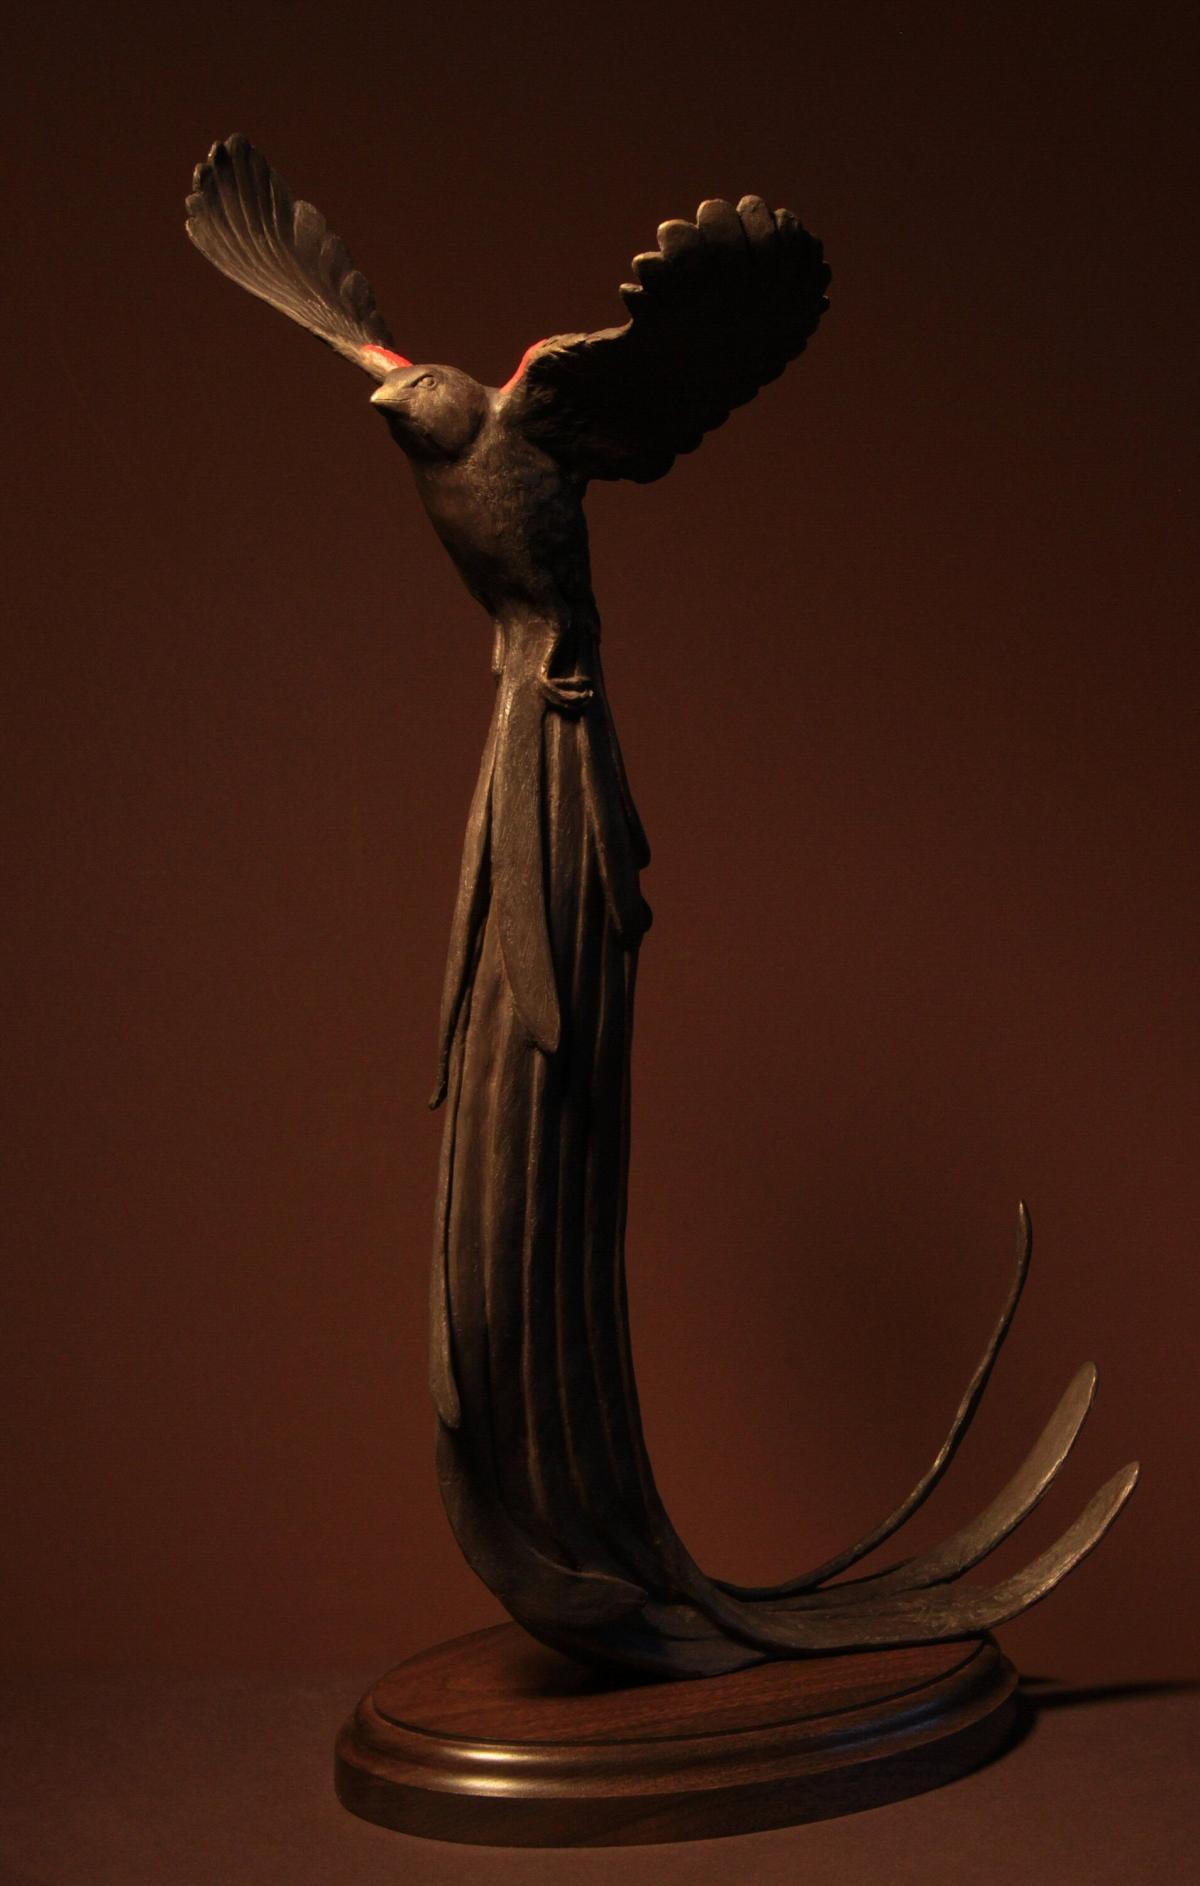 Long-tailed Widowbird   Sculpture by Douglas Aja   Artists for Conservation 2021